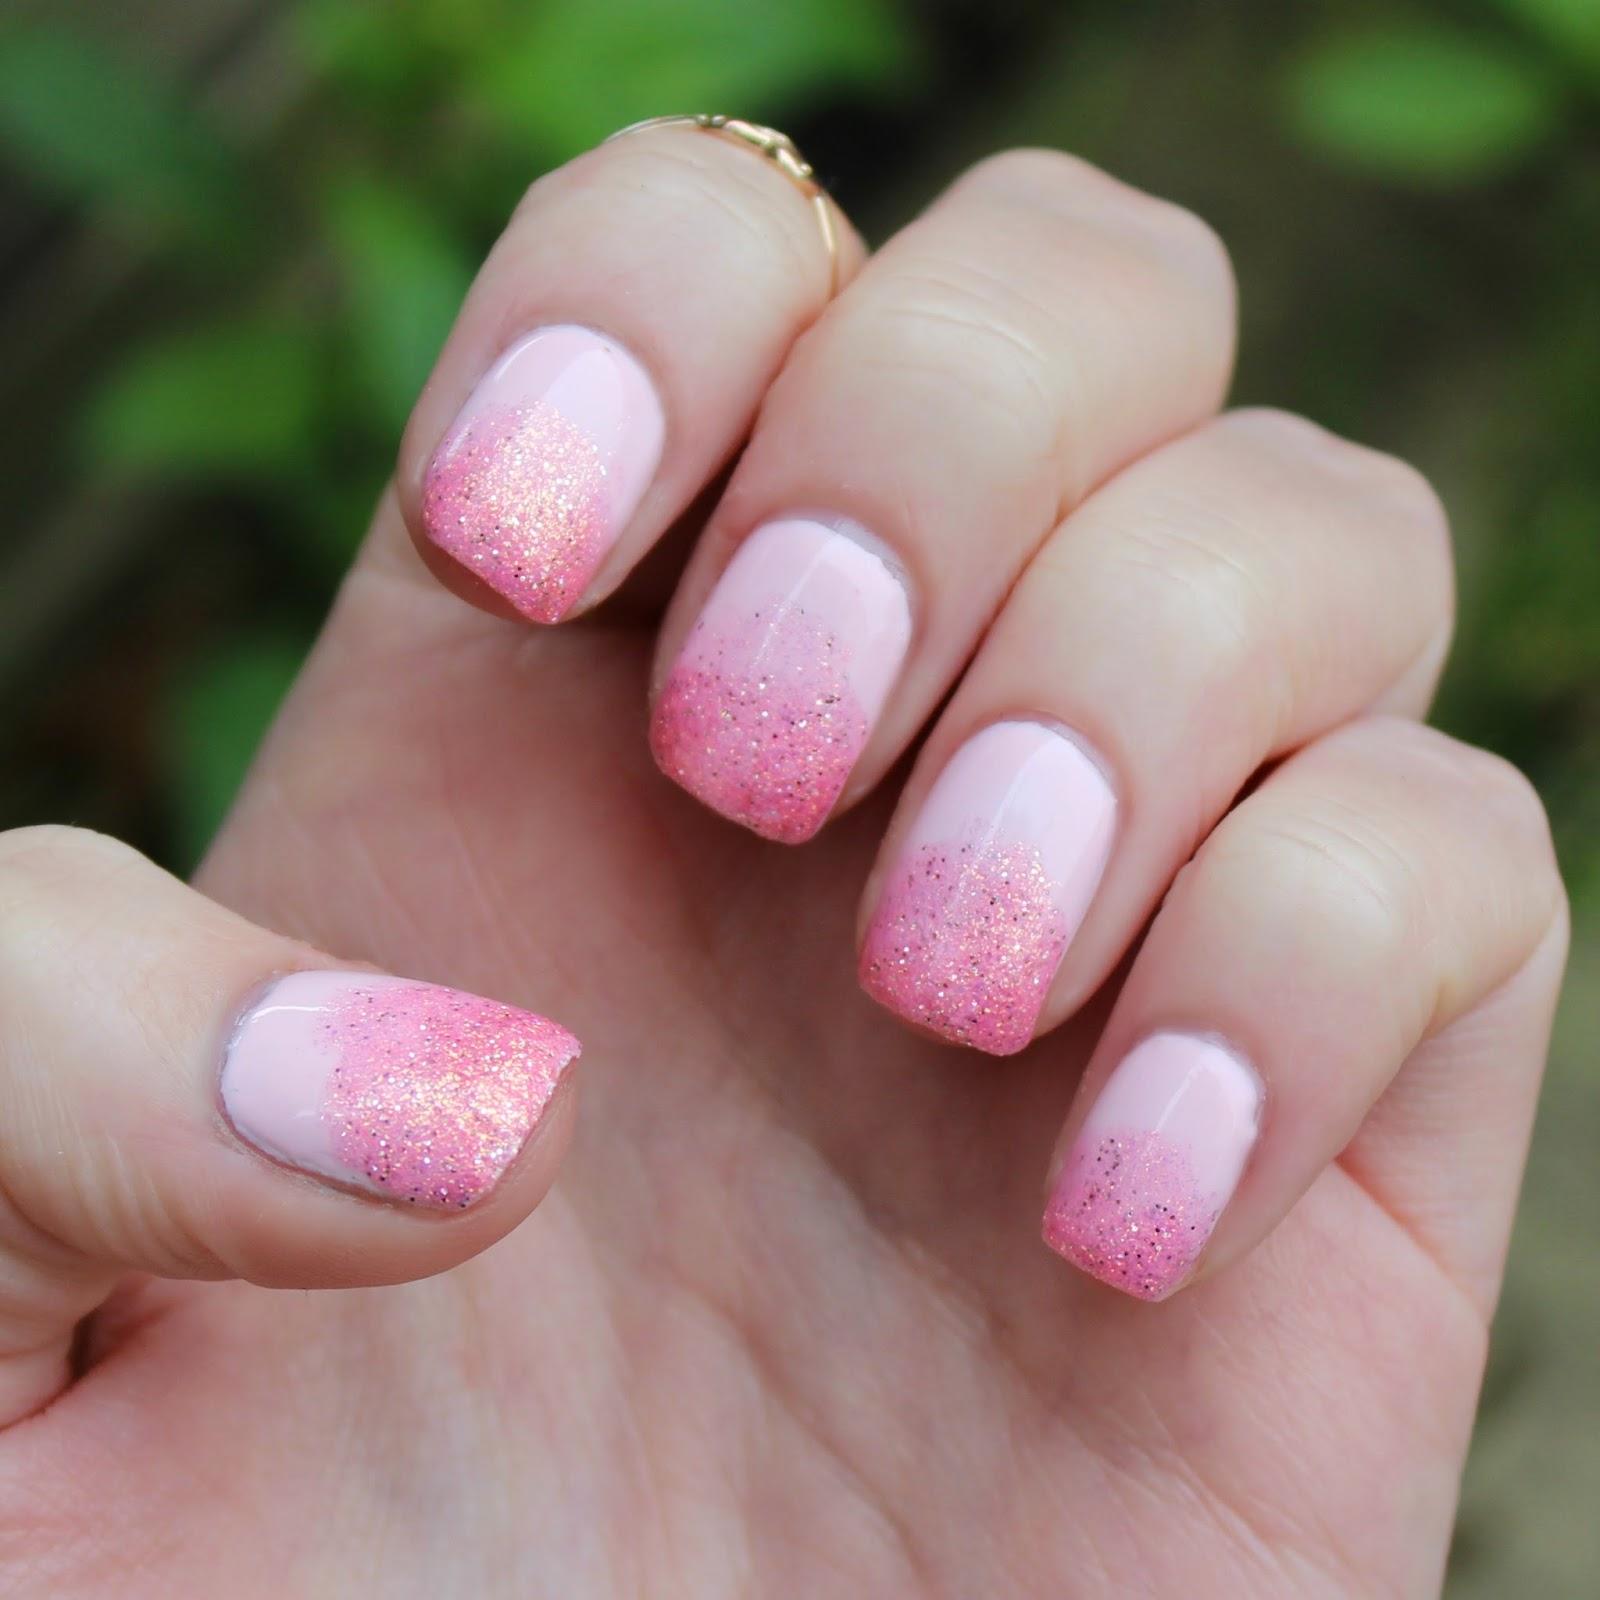 Dahlia Nails: Pink Glitter Fade